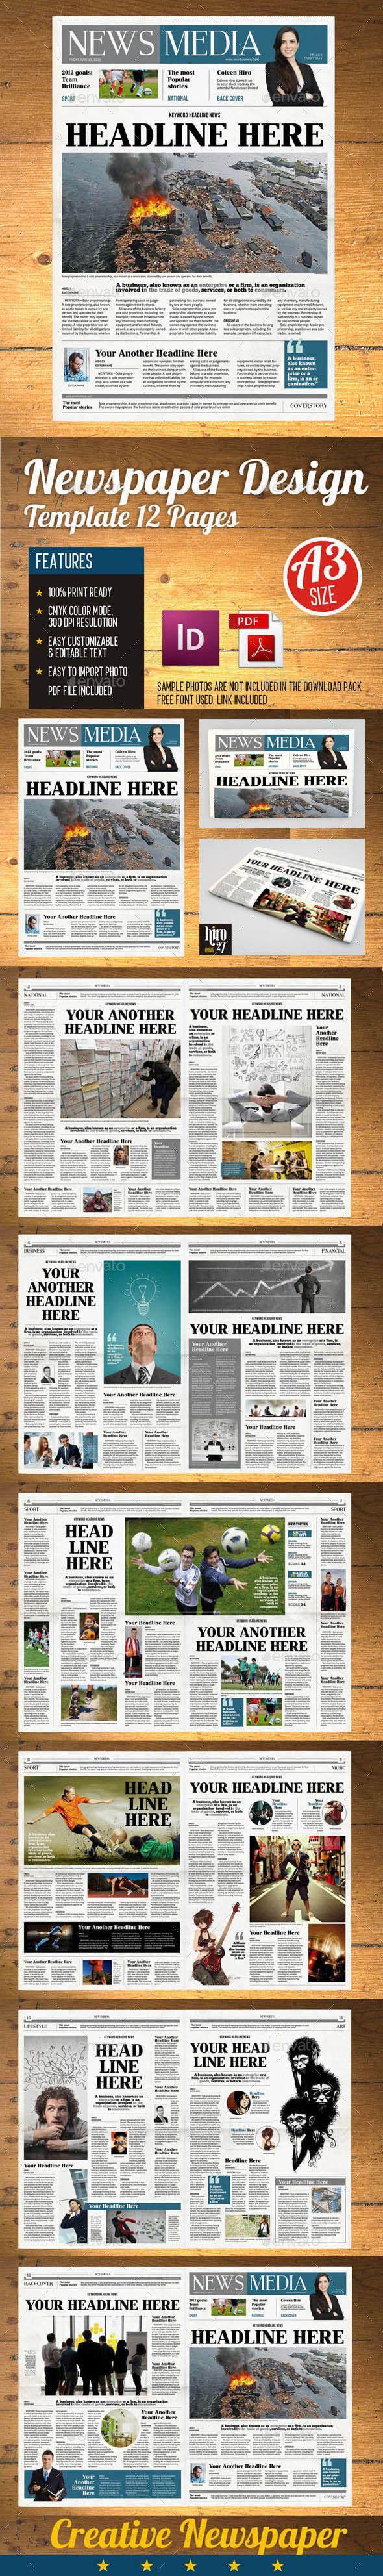 A3 Newsletter Template | Best 25 Indesign Newspaper Template Ideas On Pinterest